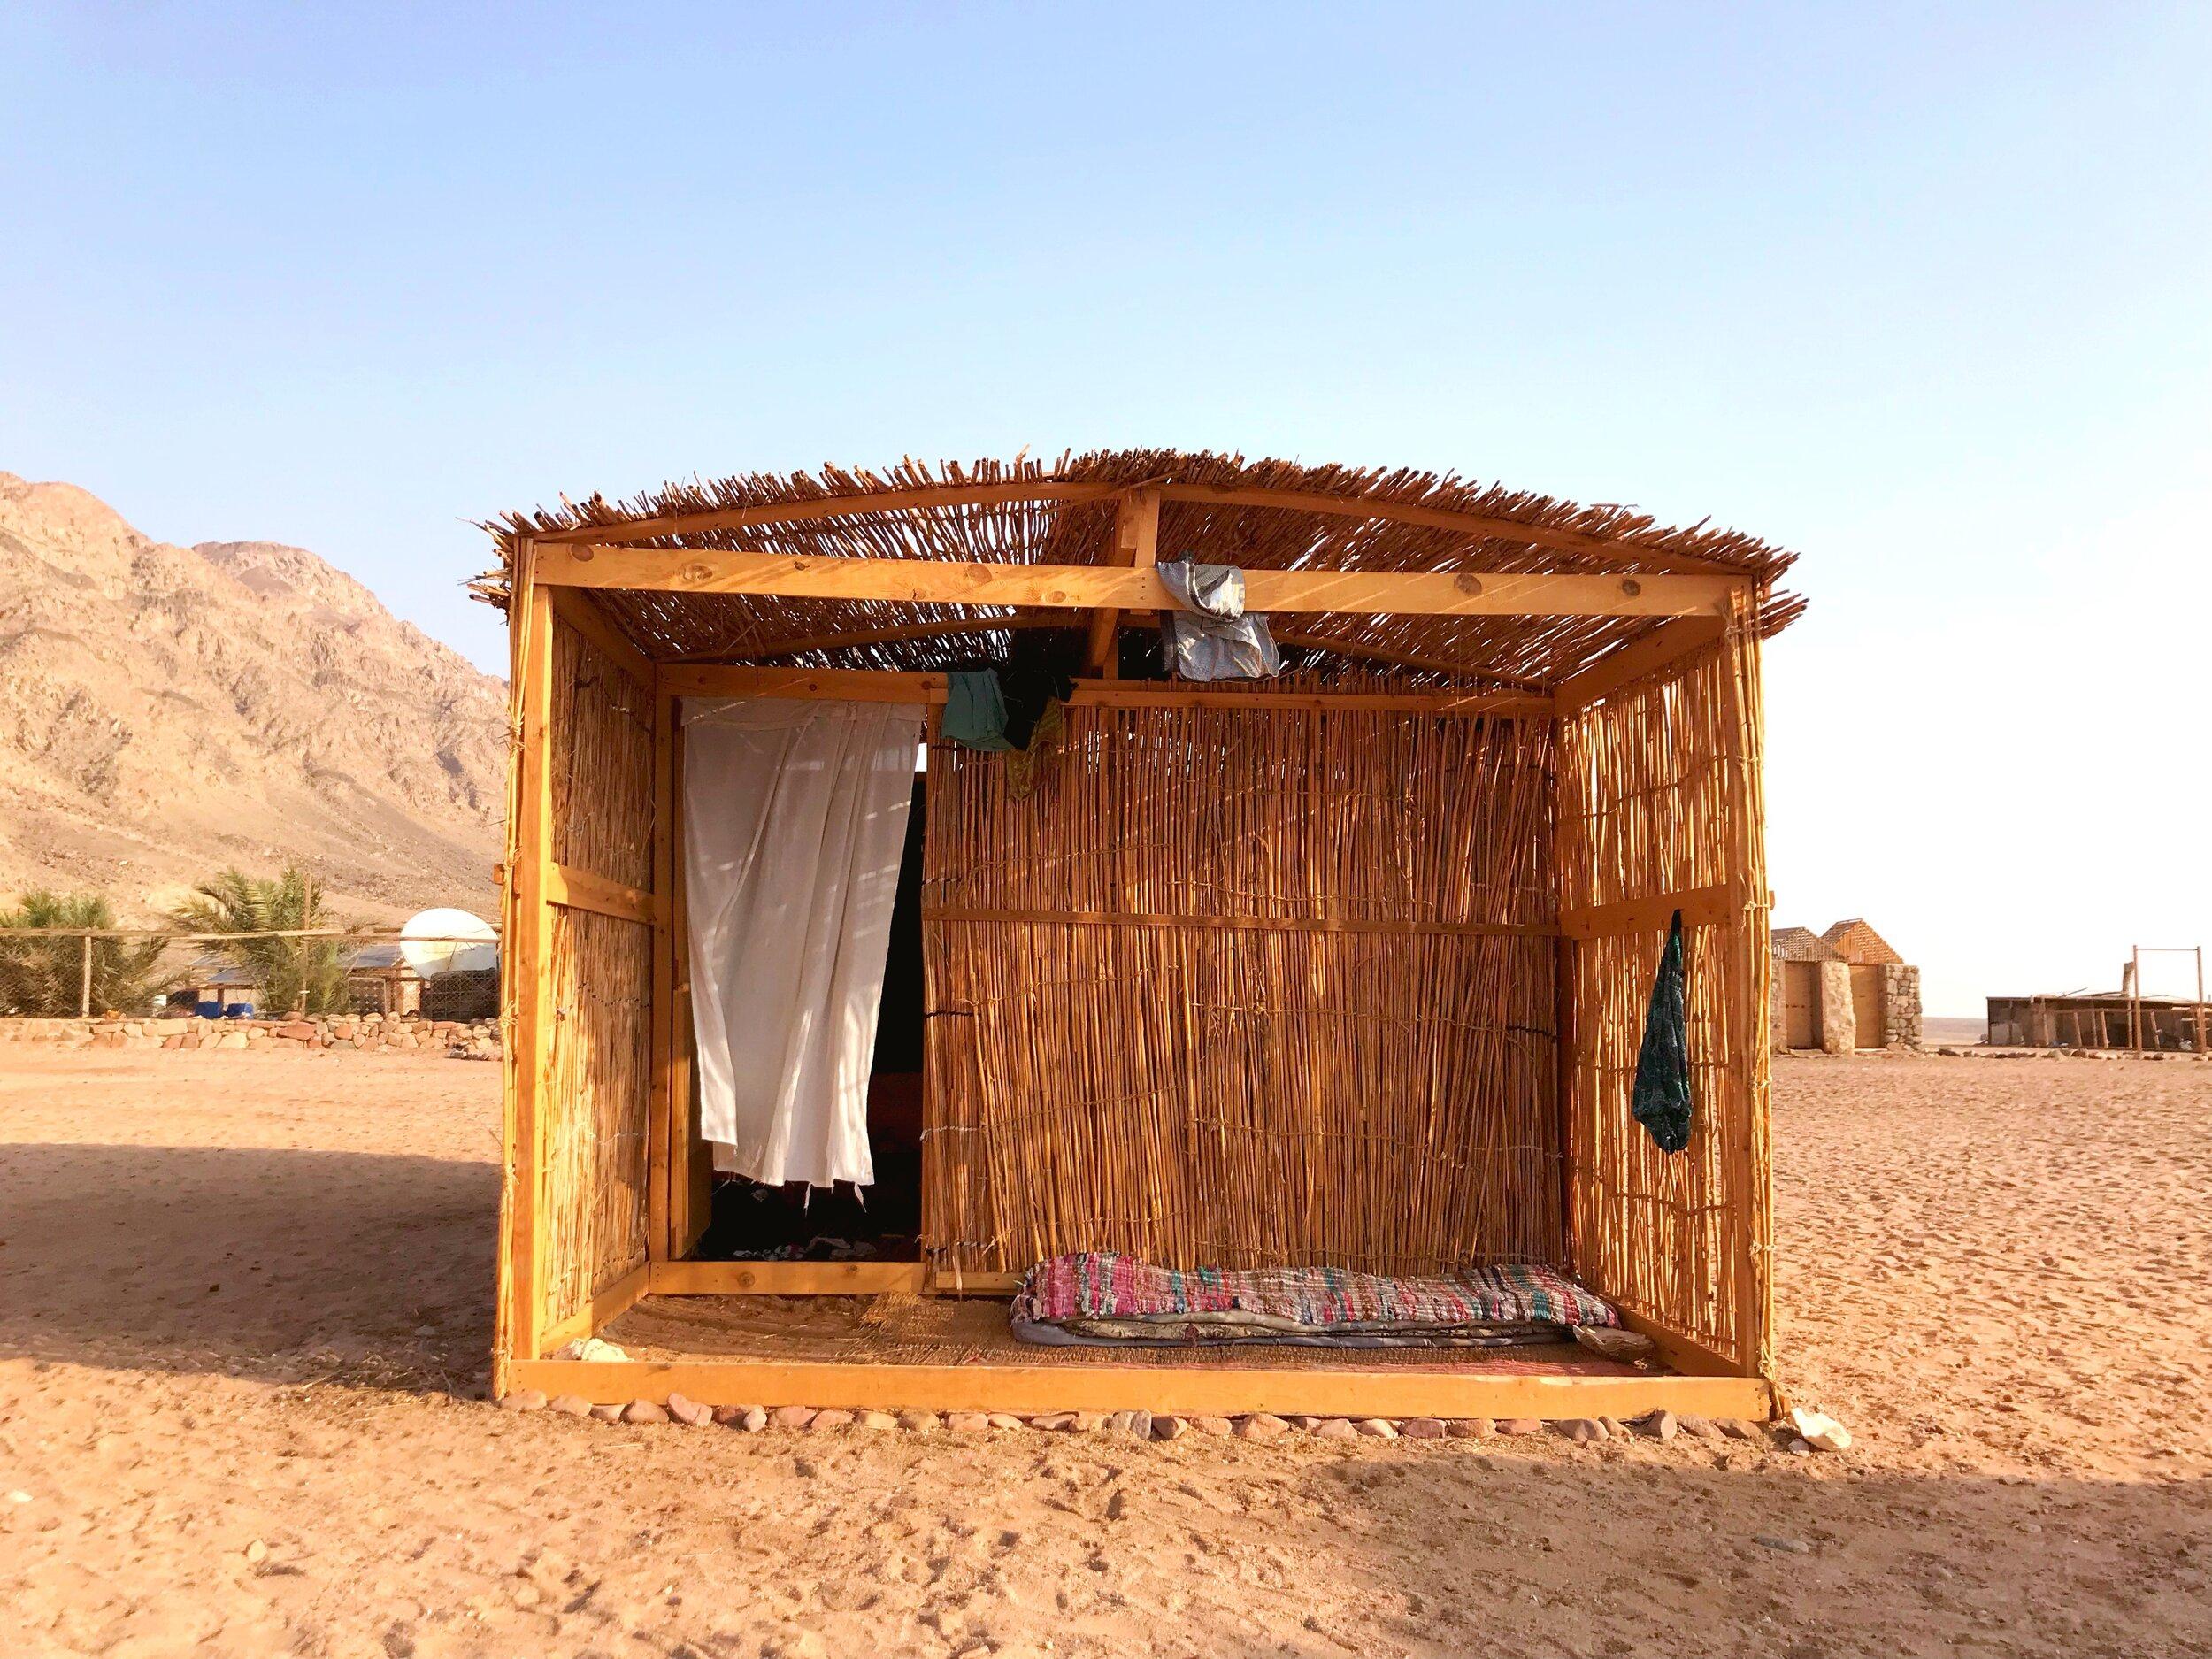 sinai-camp-egypt-family-travel-blogger-negra-bohemian